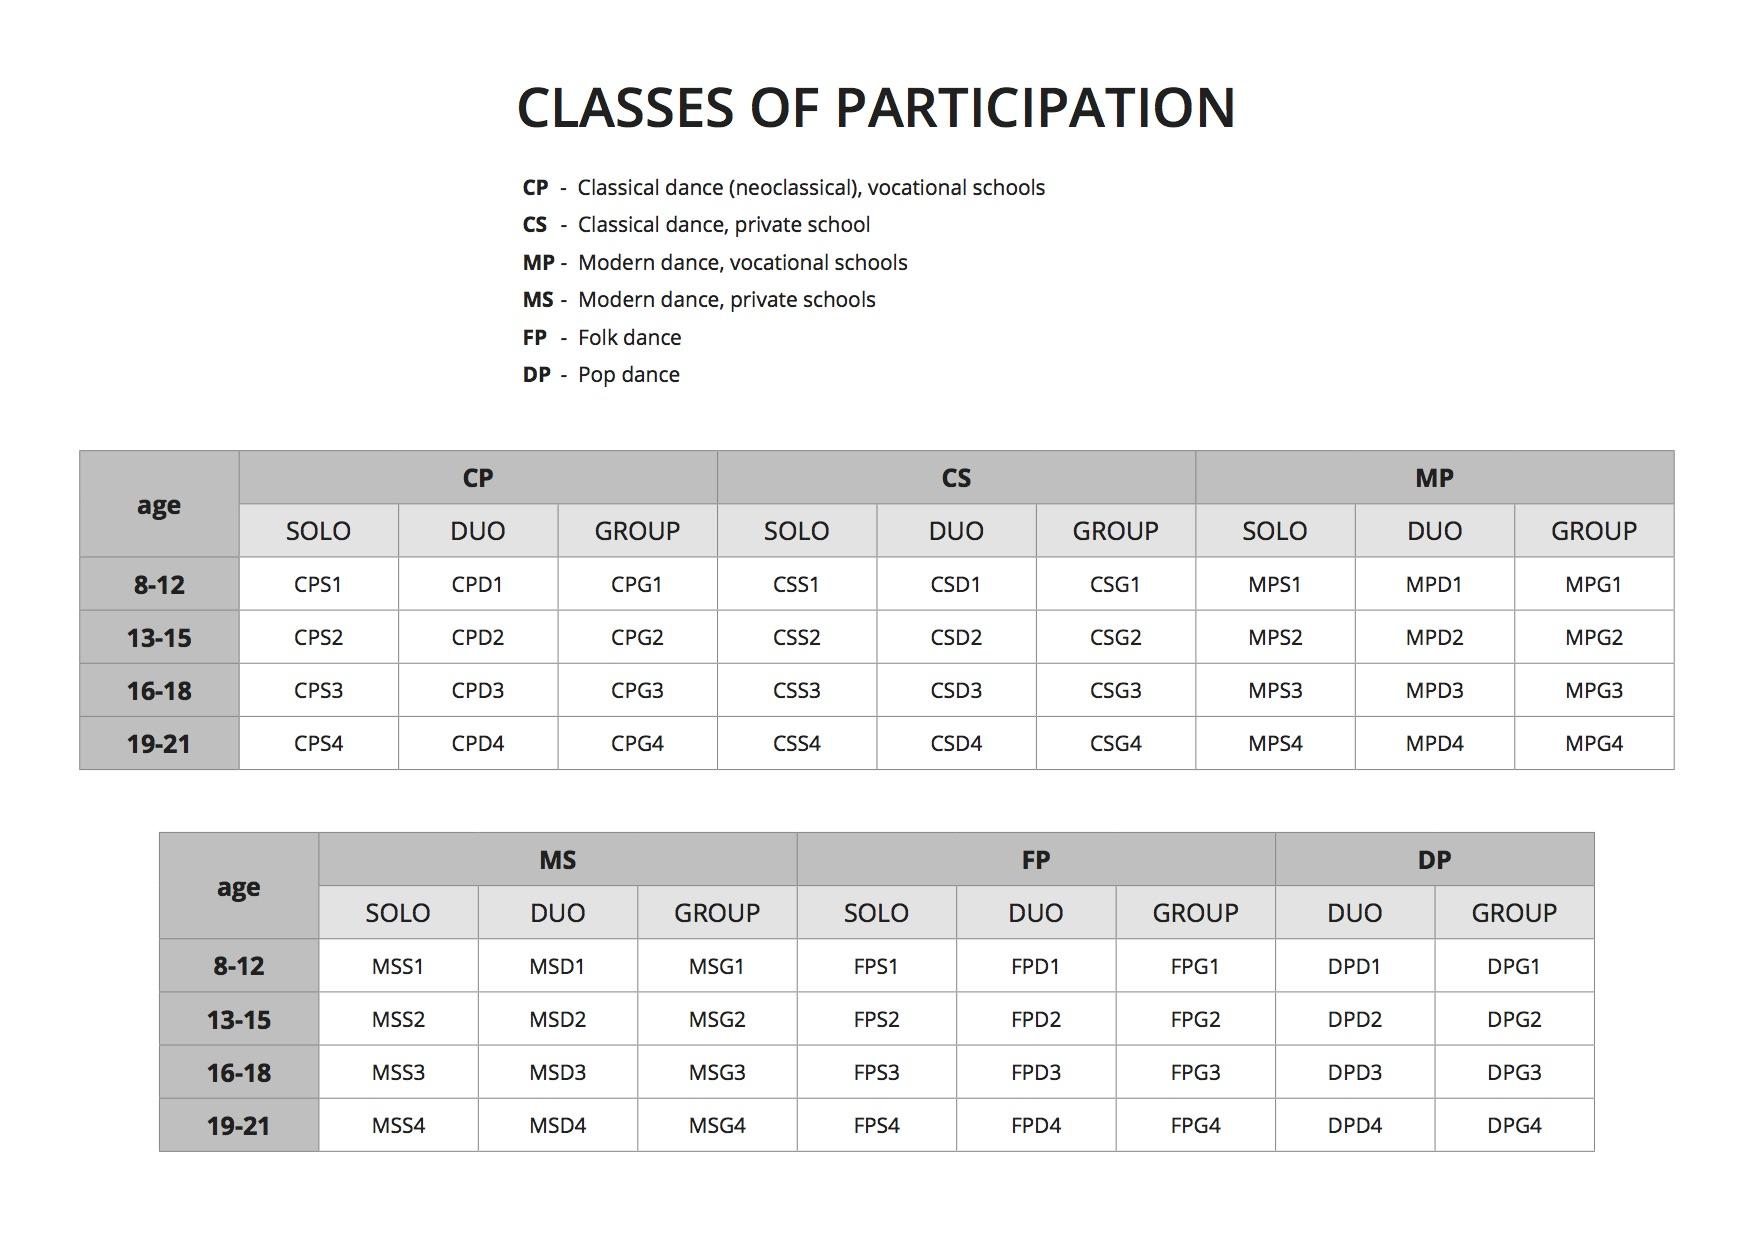 Classes of participation